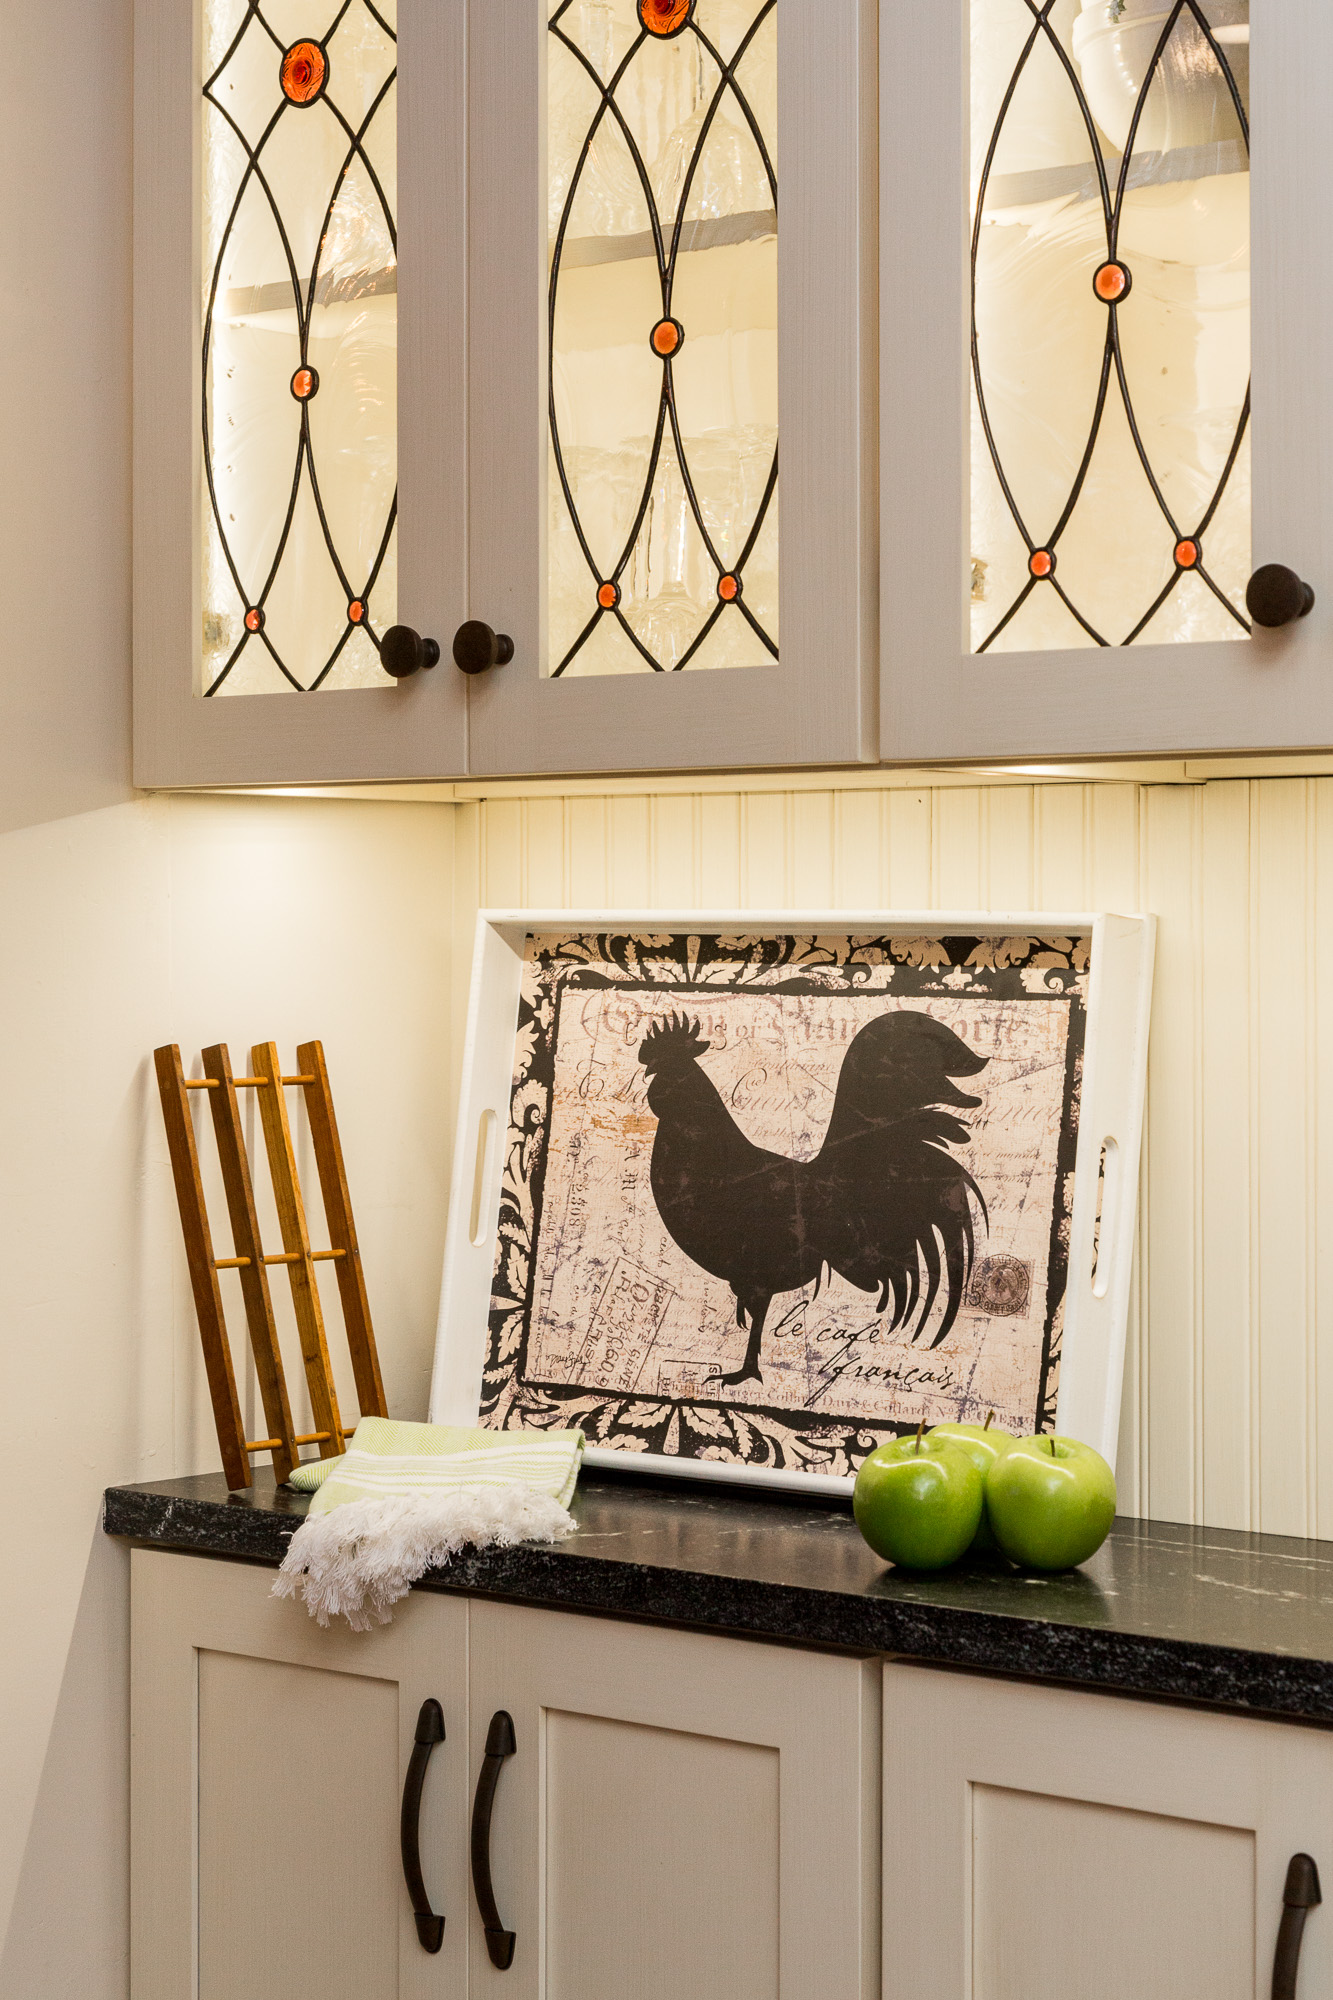 Картина с петушком для декора кухни